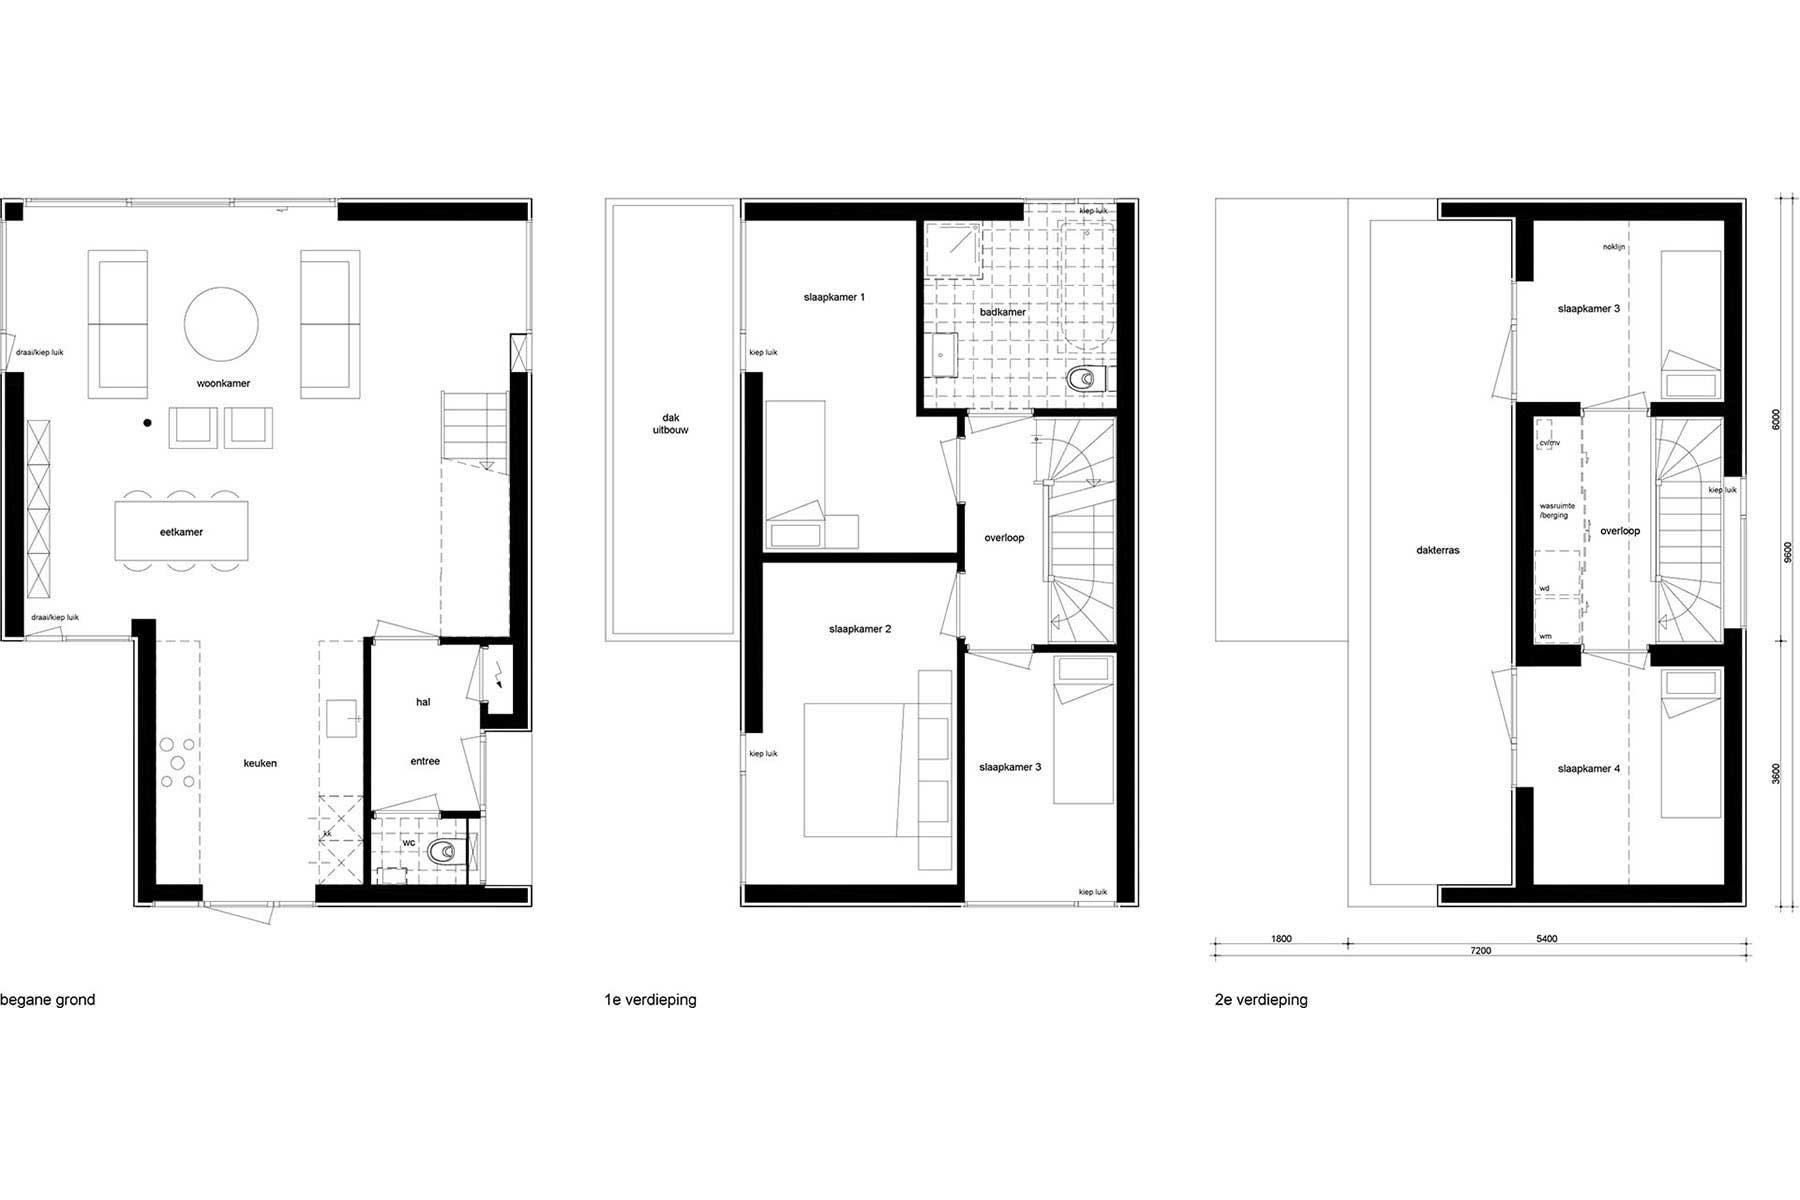 8A-Architecten-datcha-house-4-Lent-10